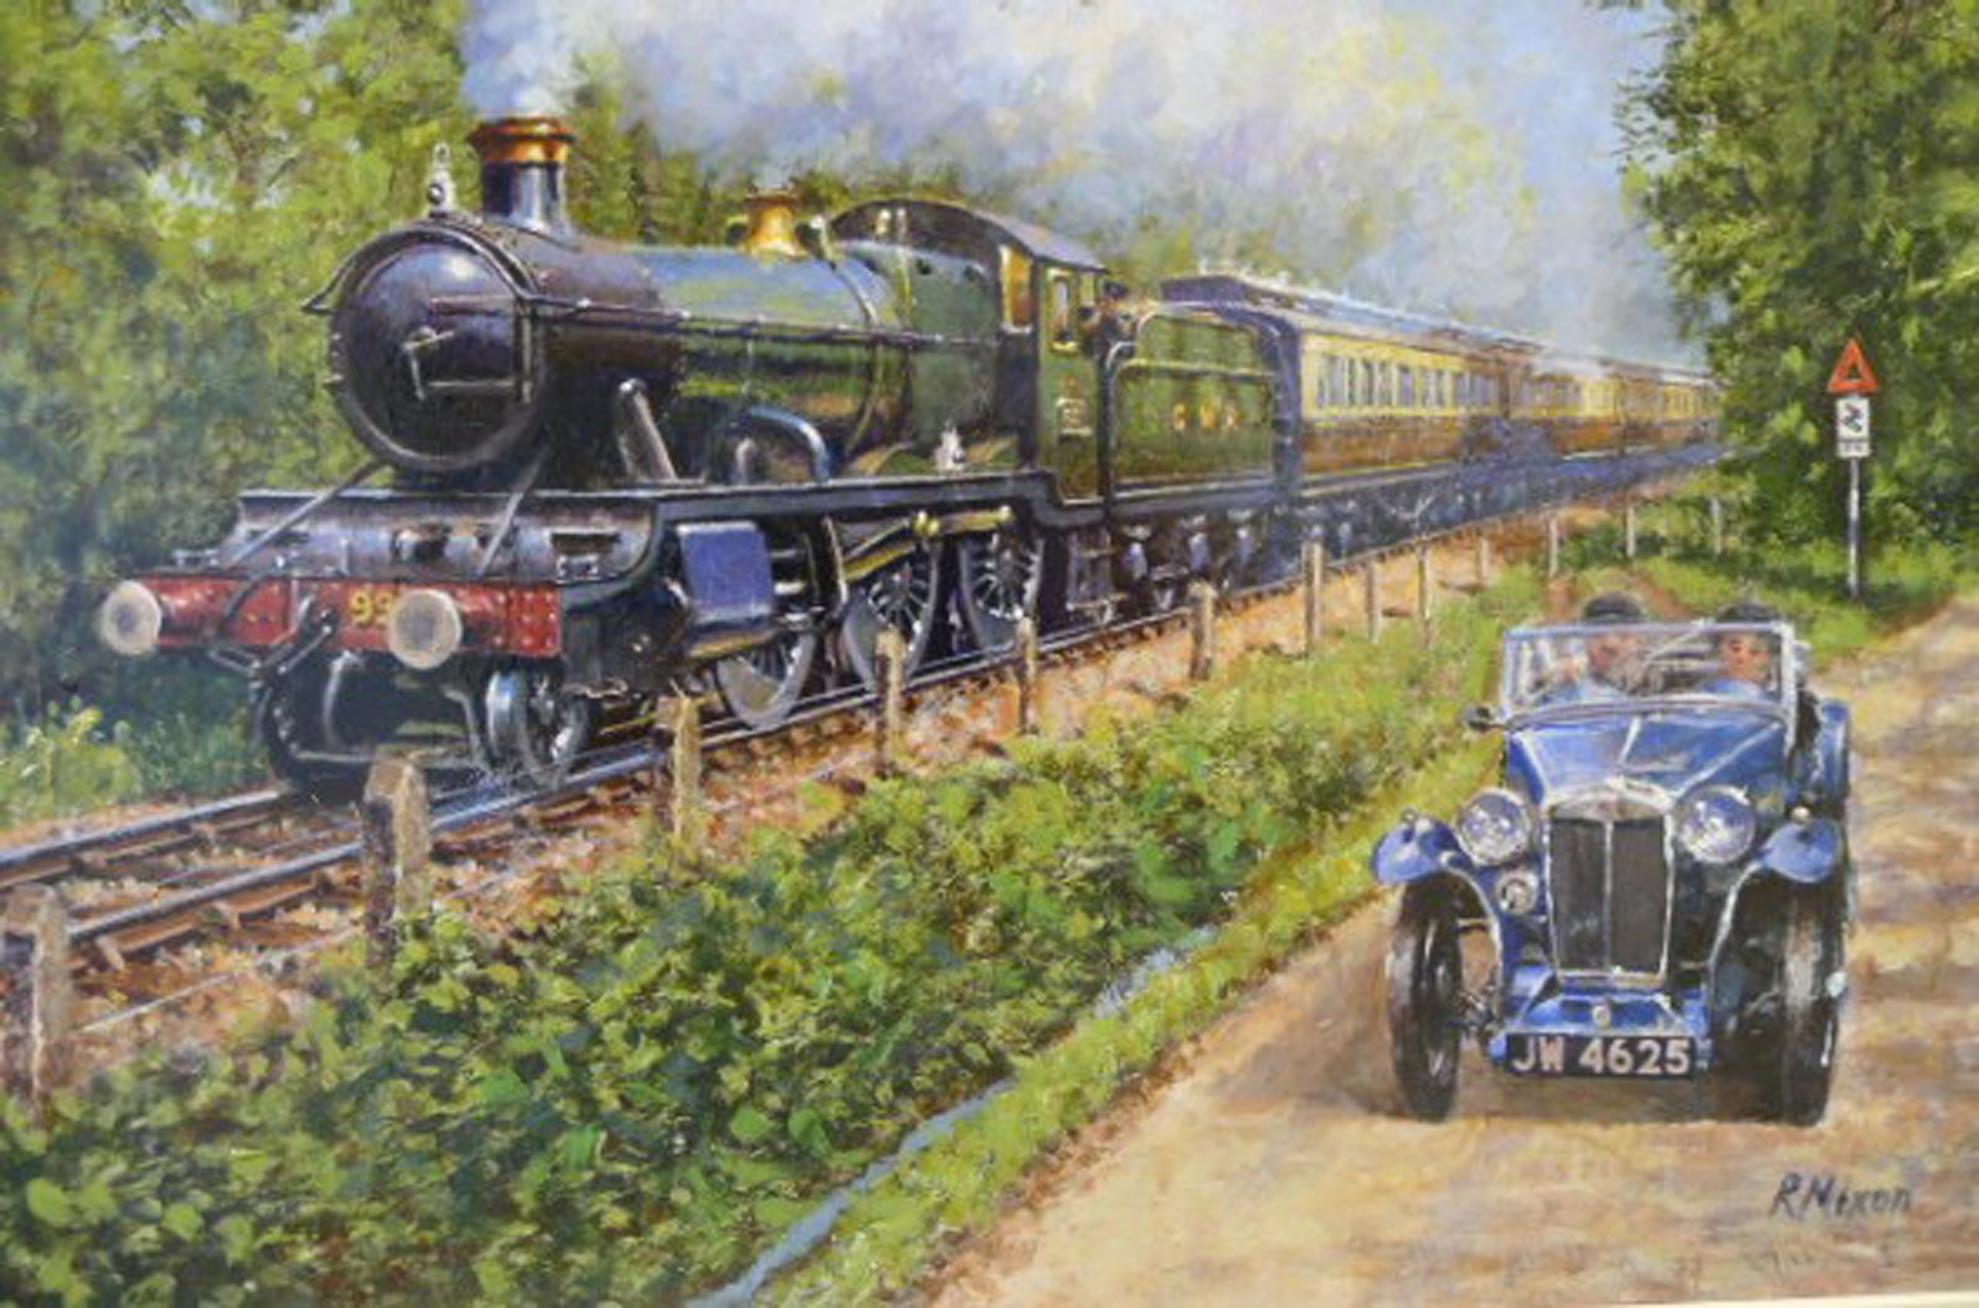 Racing The Train by Robert Nixon